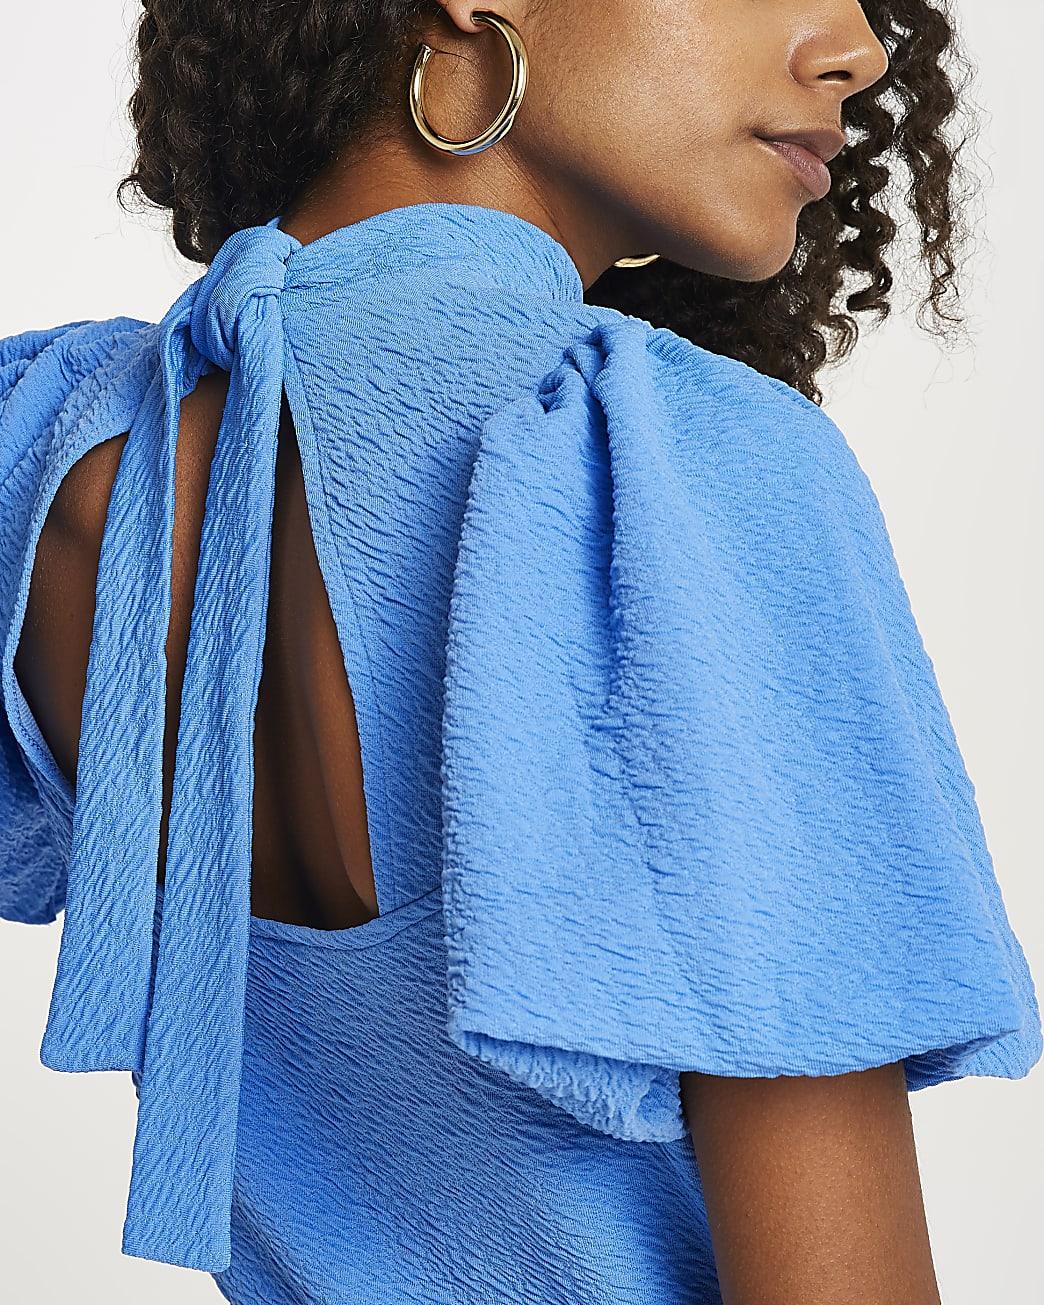 Blue textured high neck tie back top